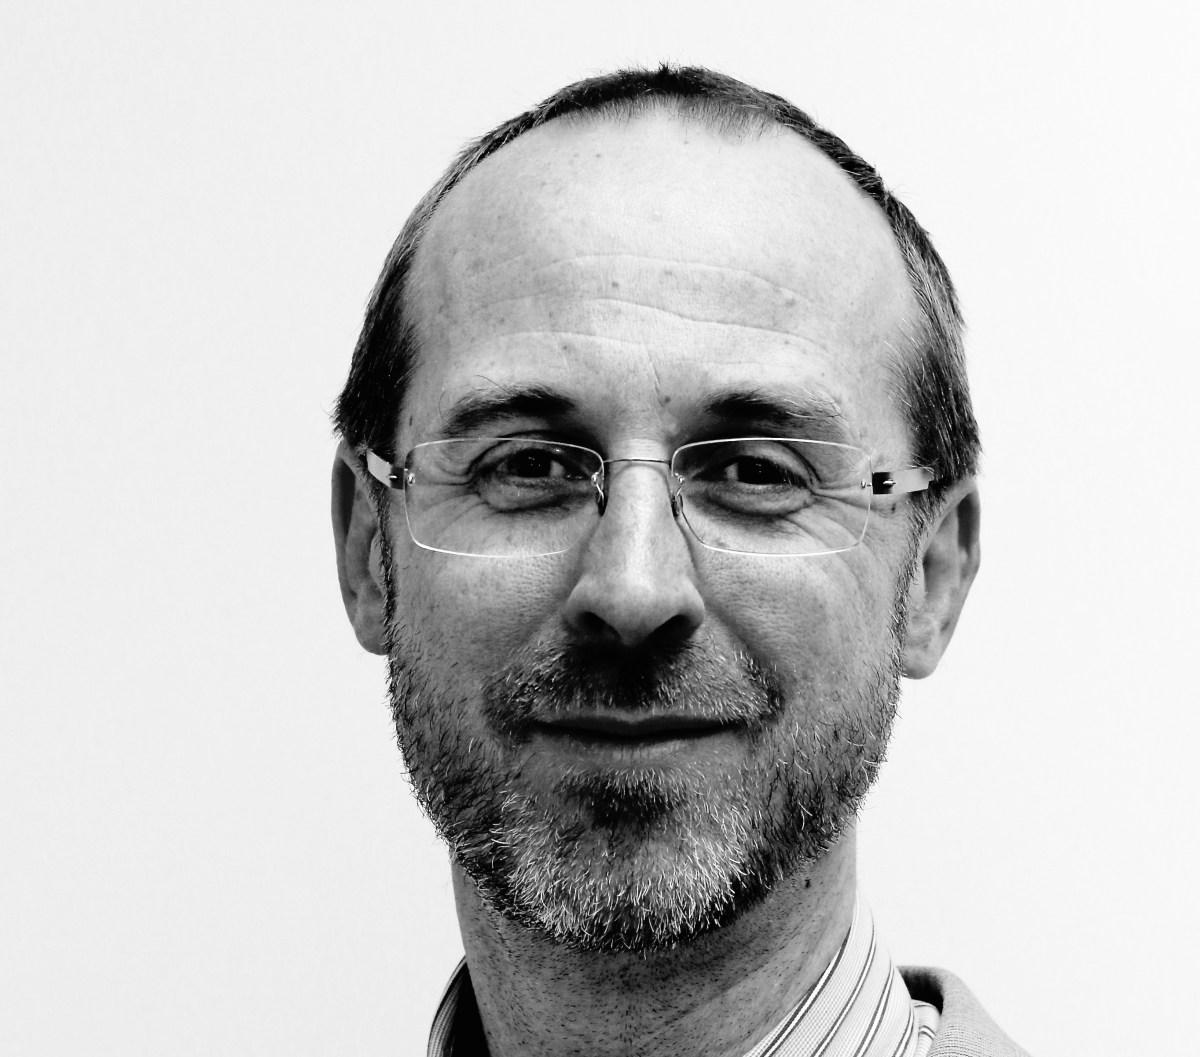 Ludovic Leforestier